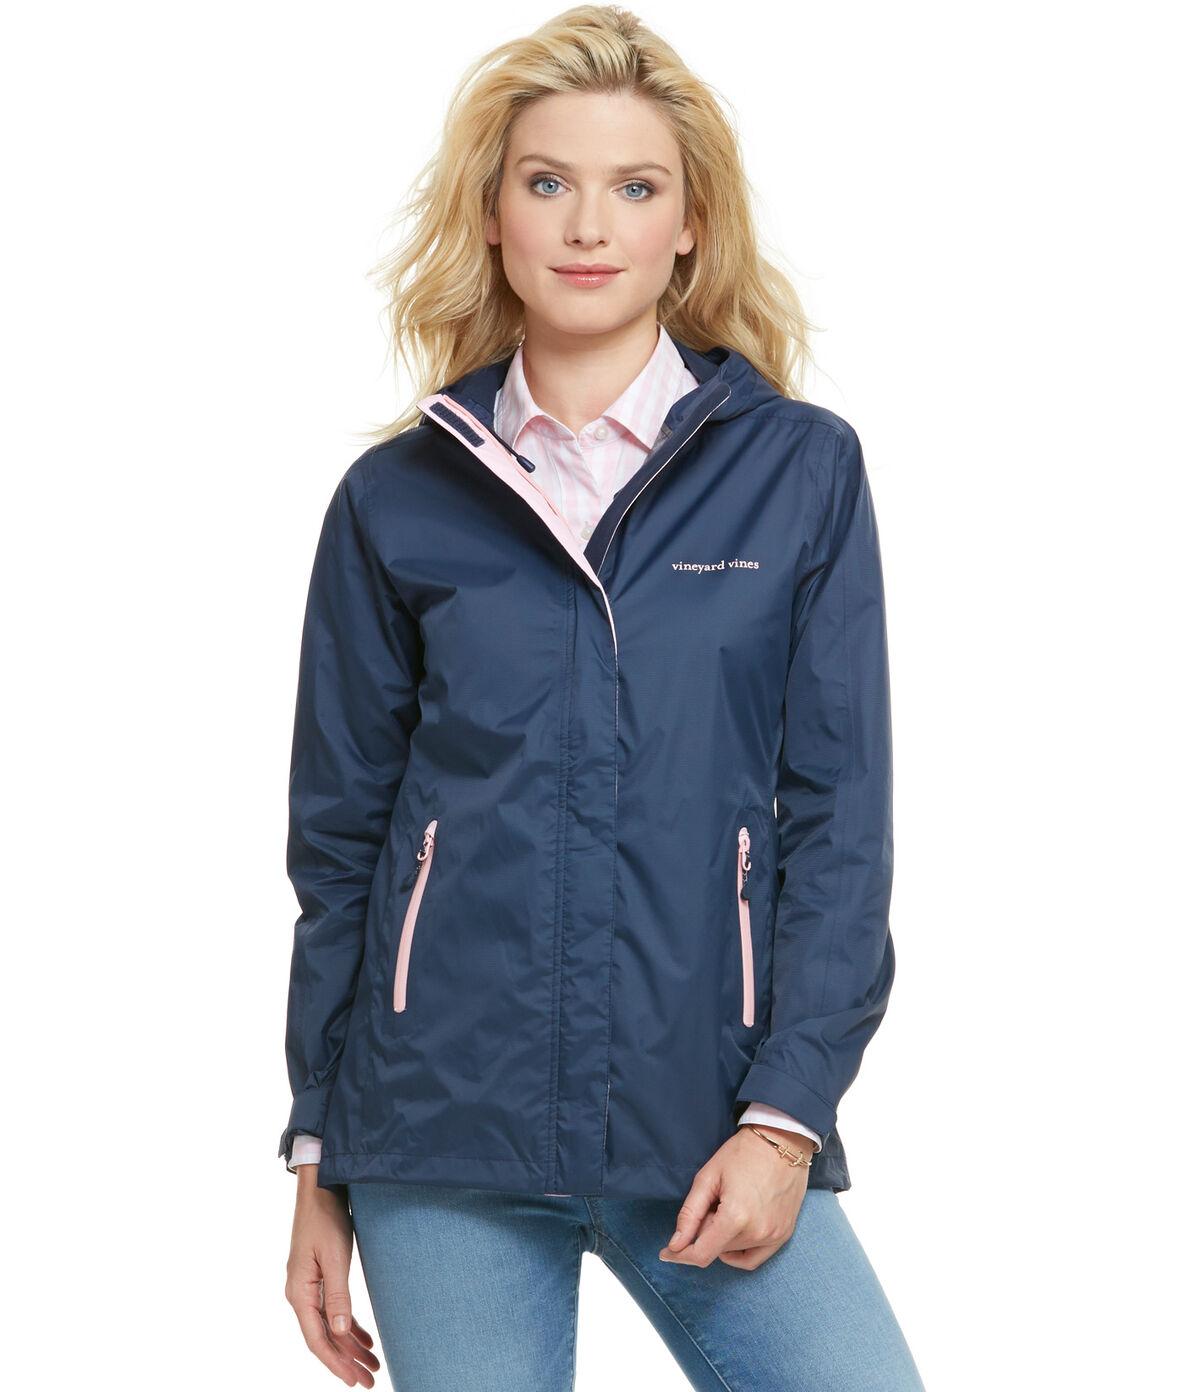 Shop Stow & Go Rain Coat at vineyard vines